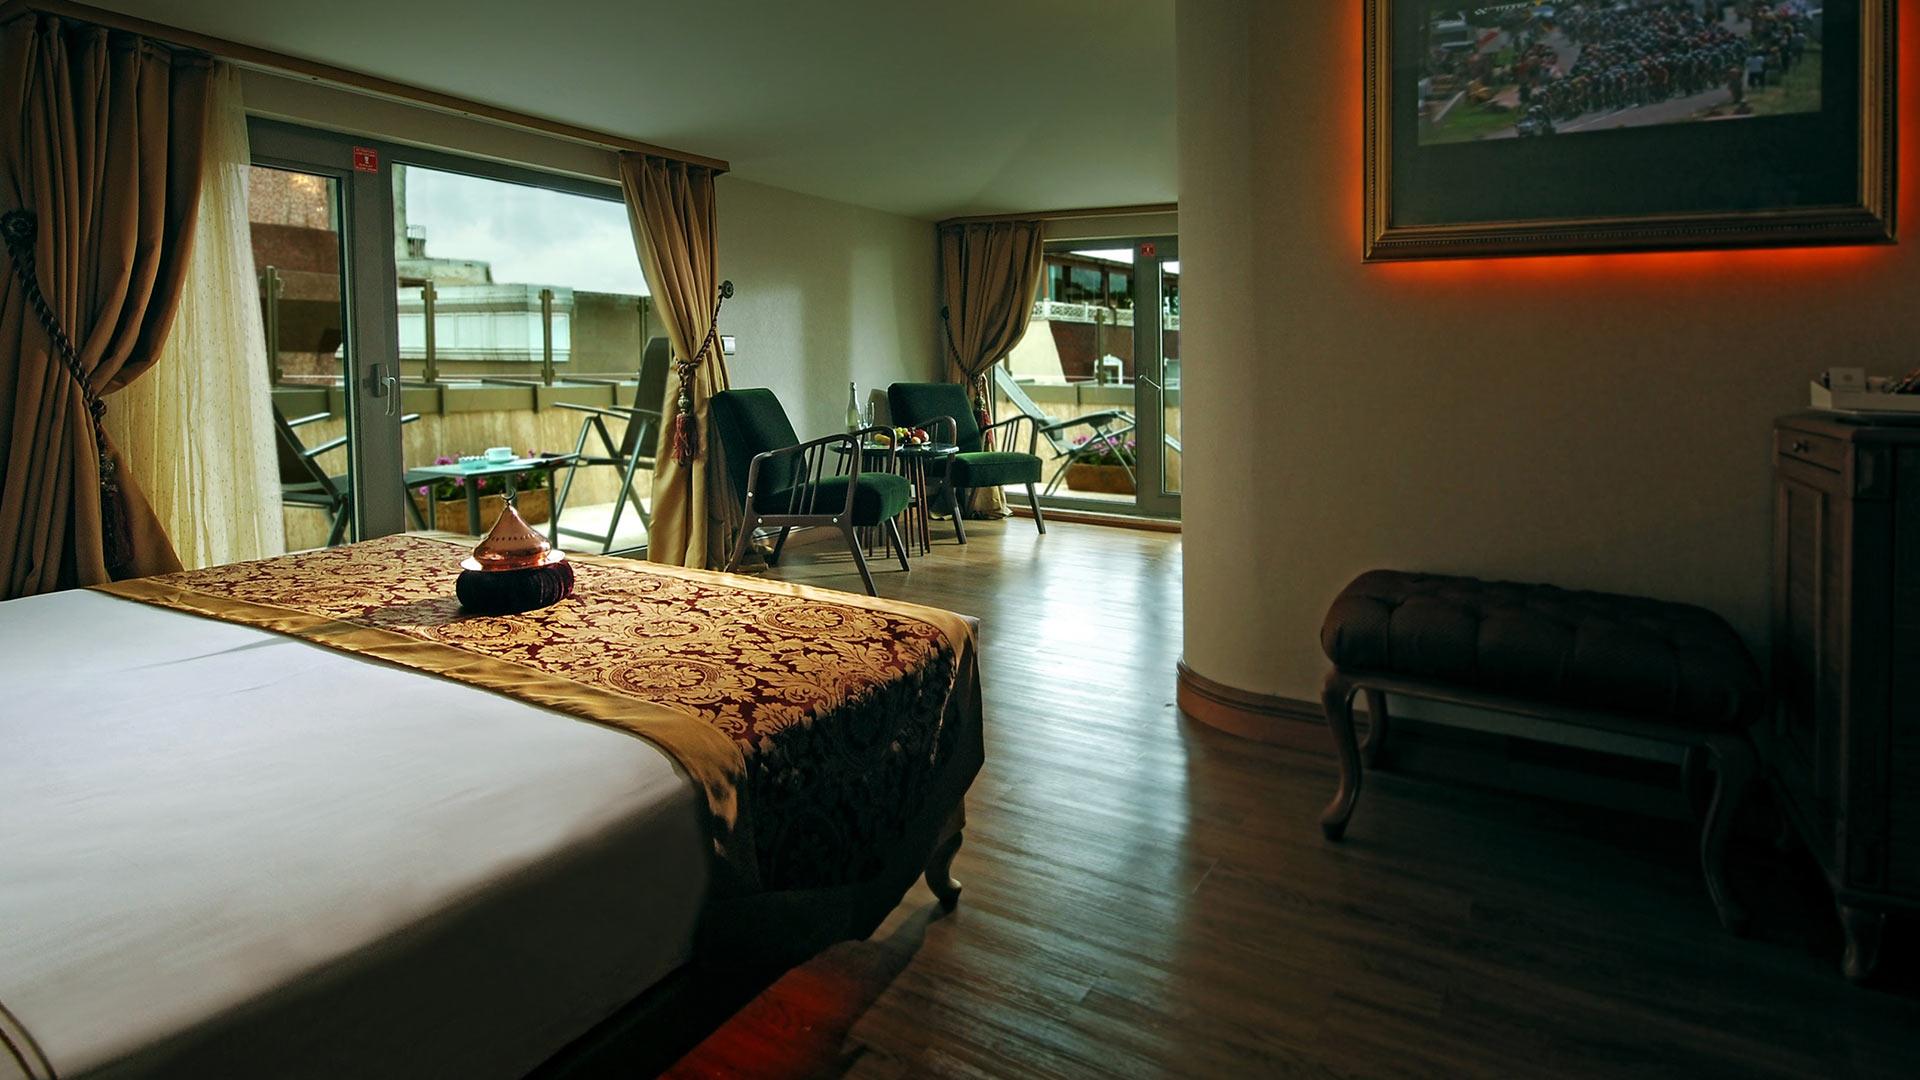 Hotel_Room_with_Balcony